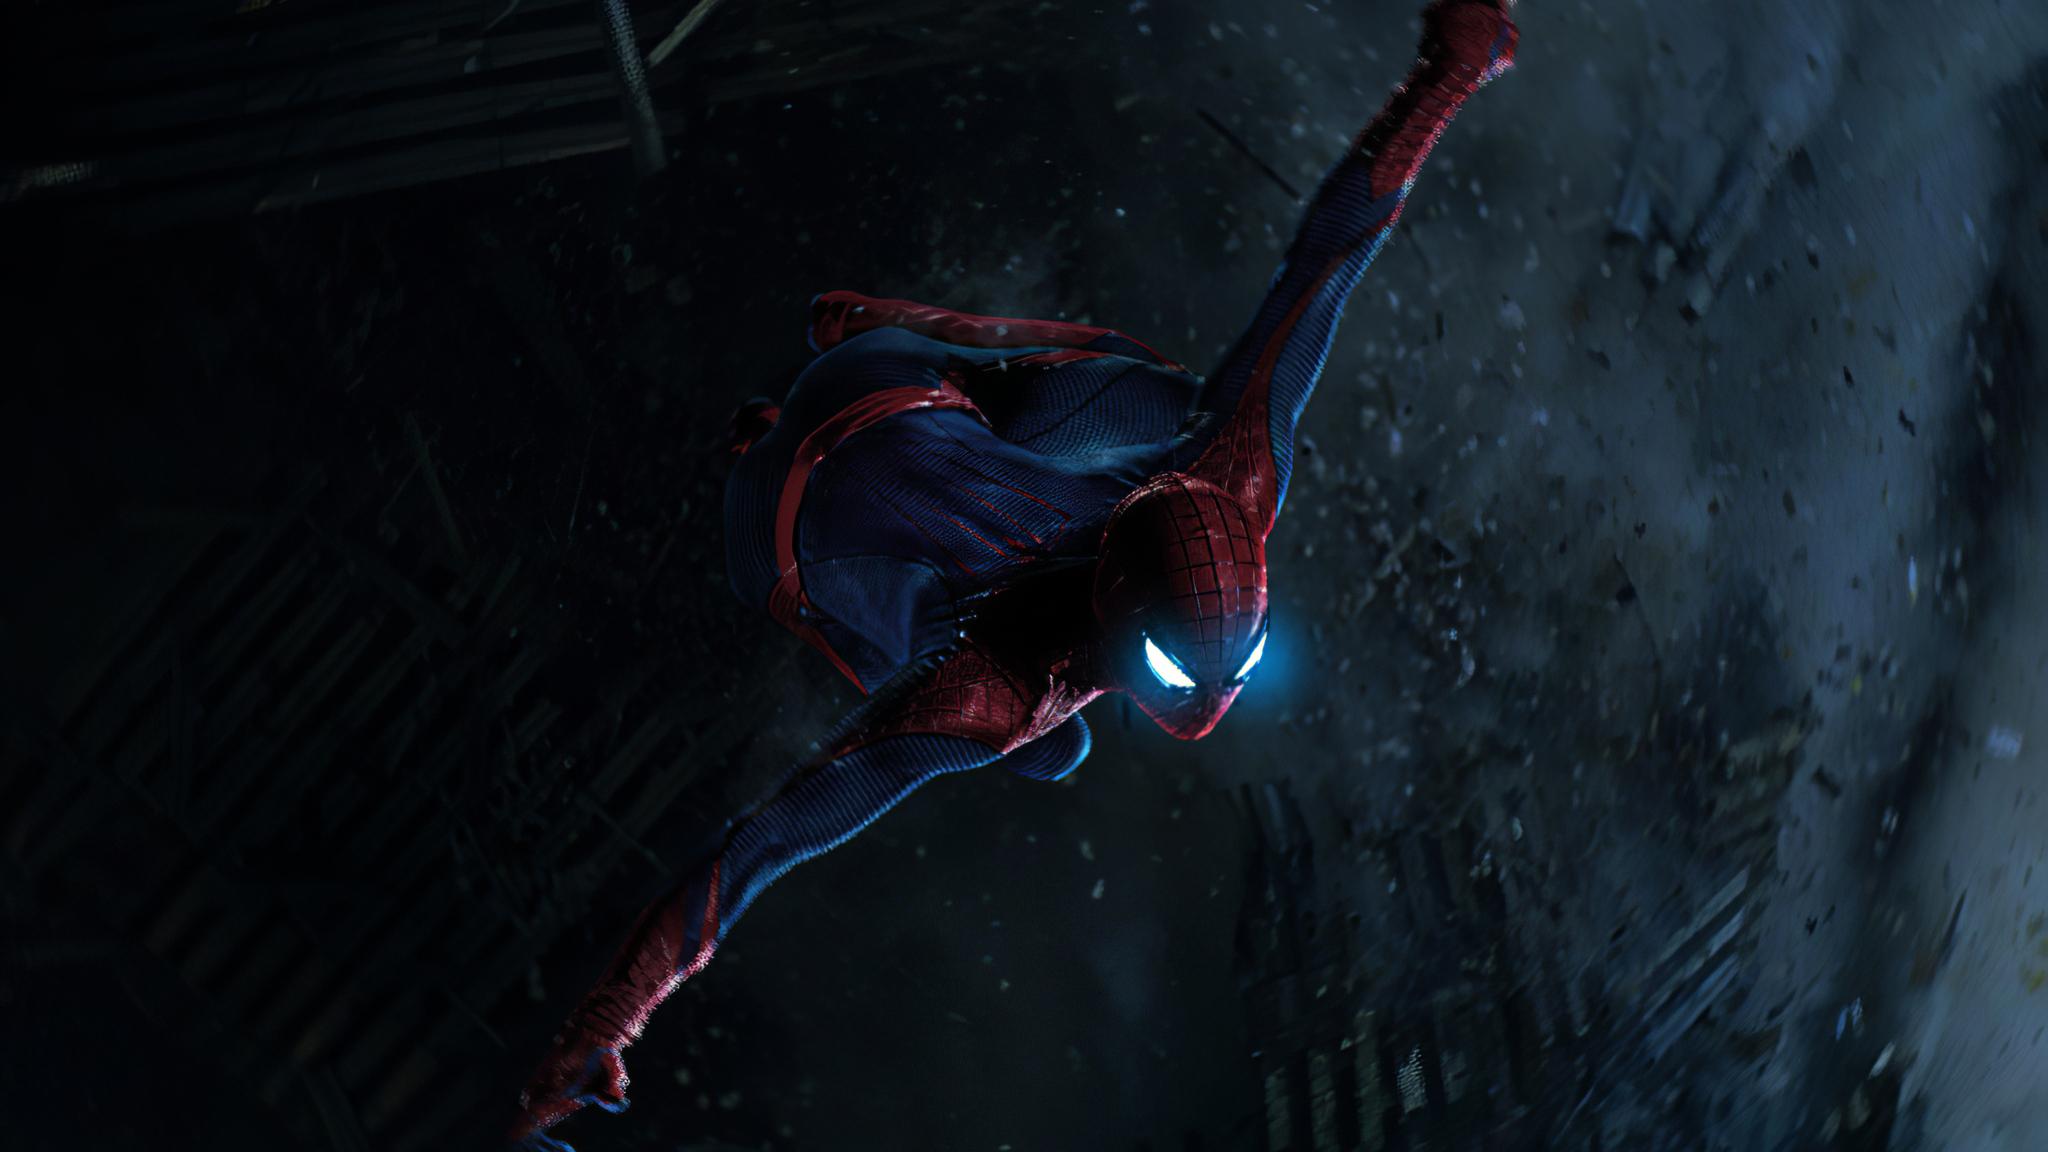 spiderman-night-hq.jpg